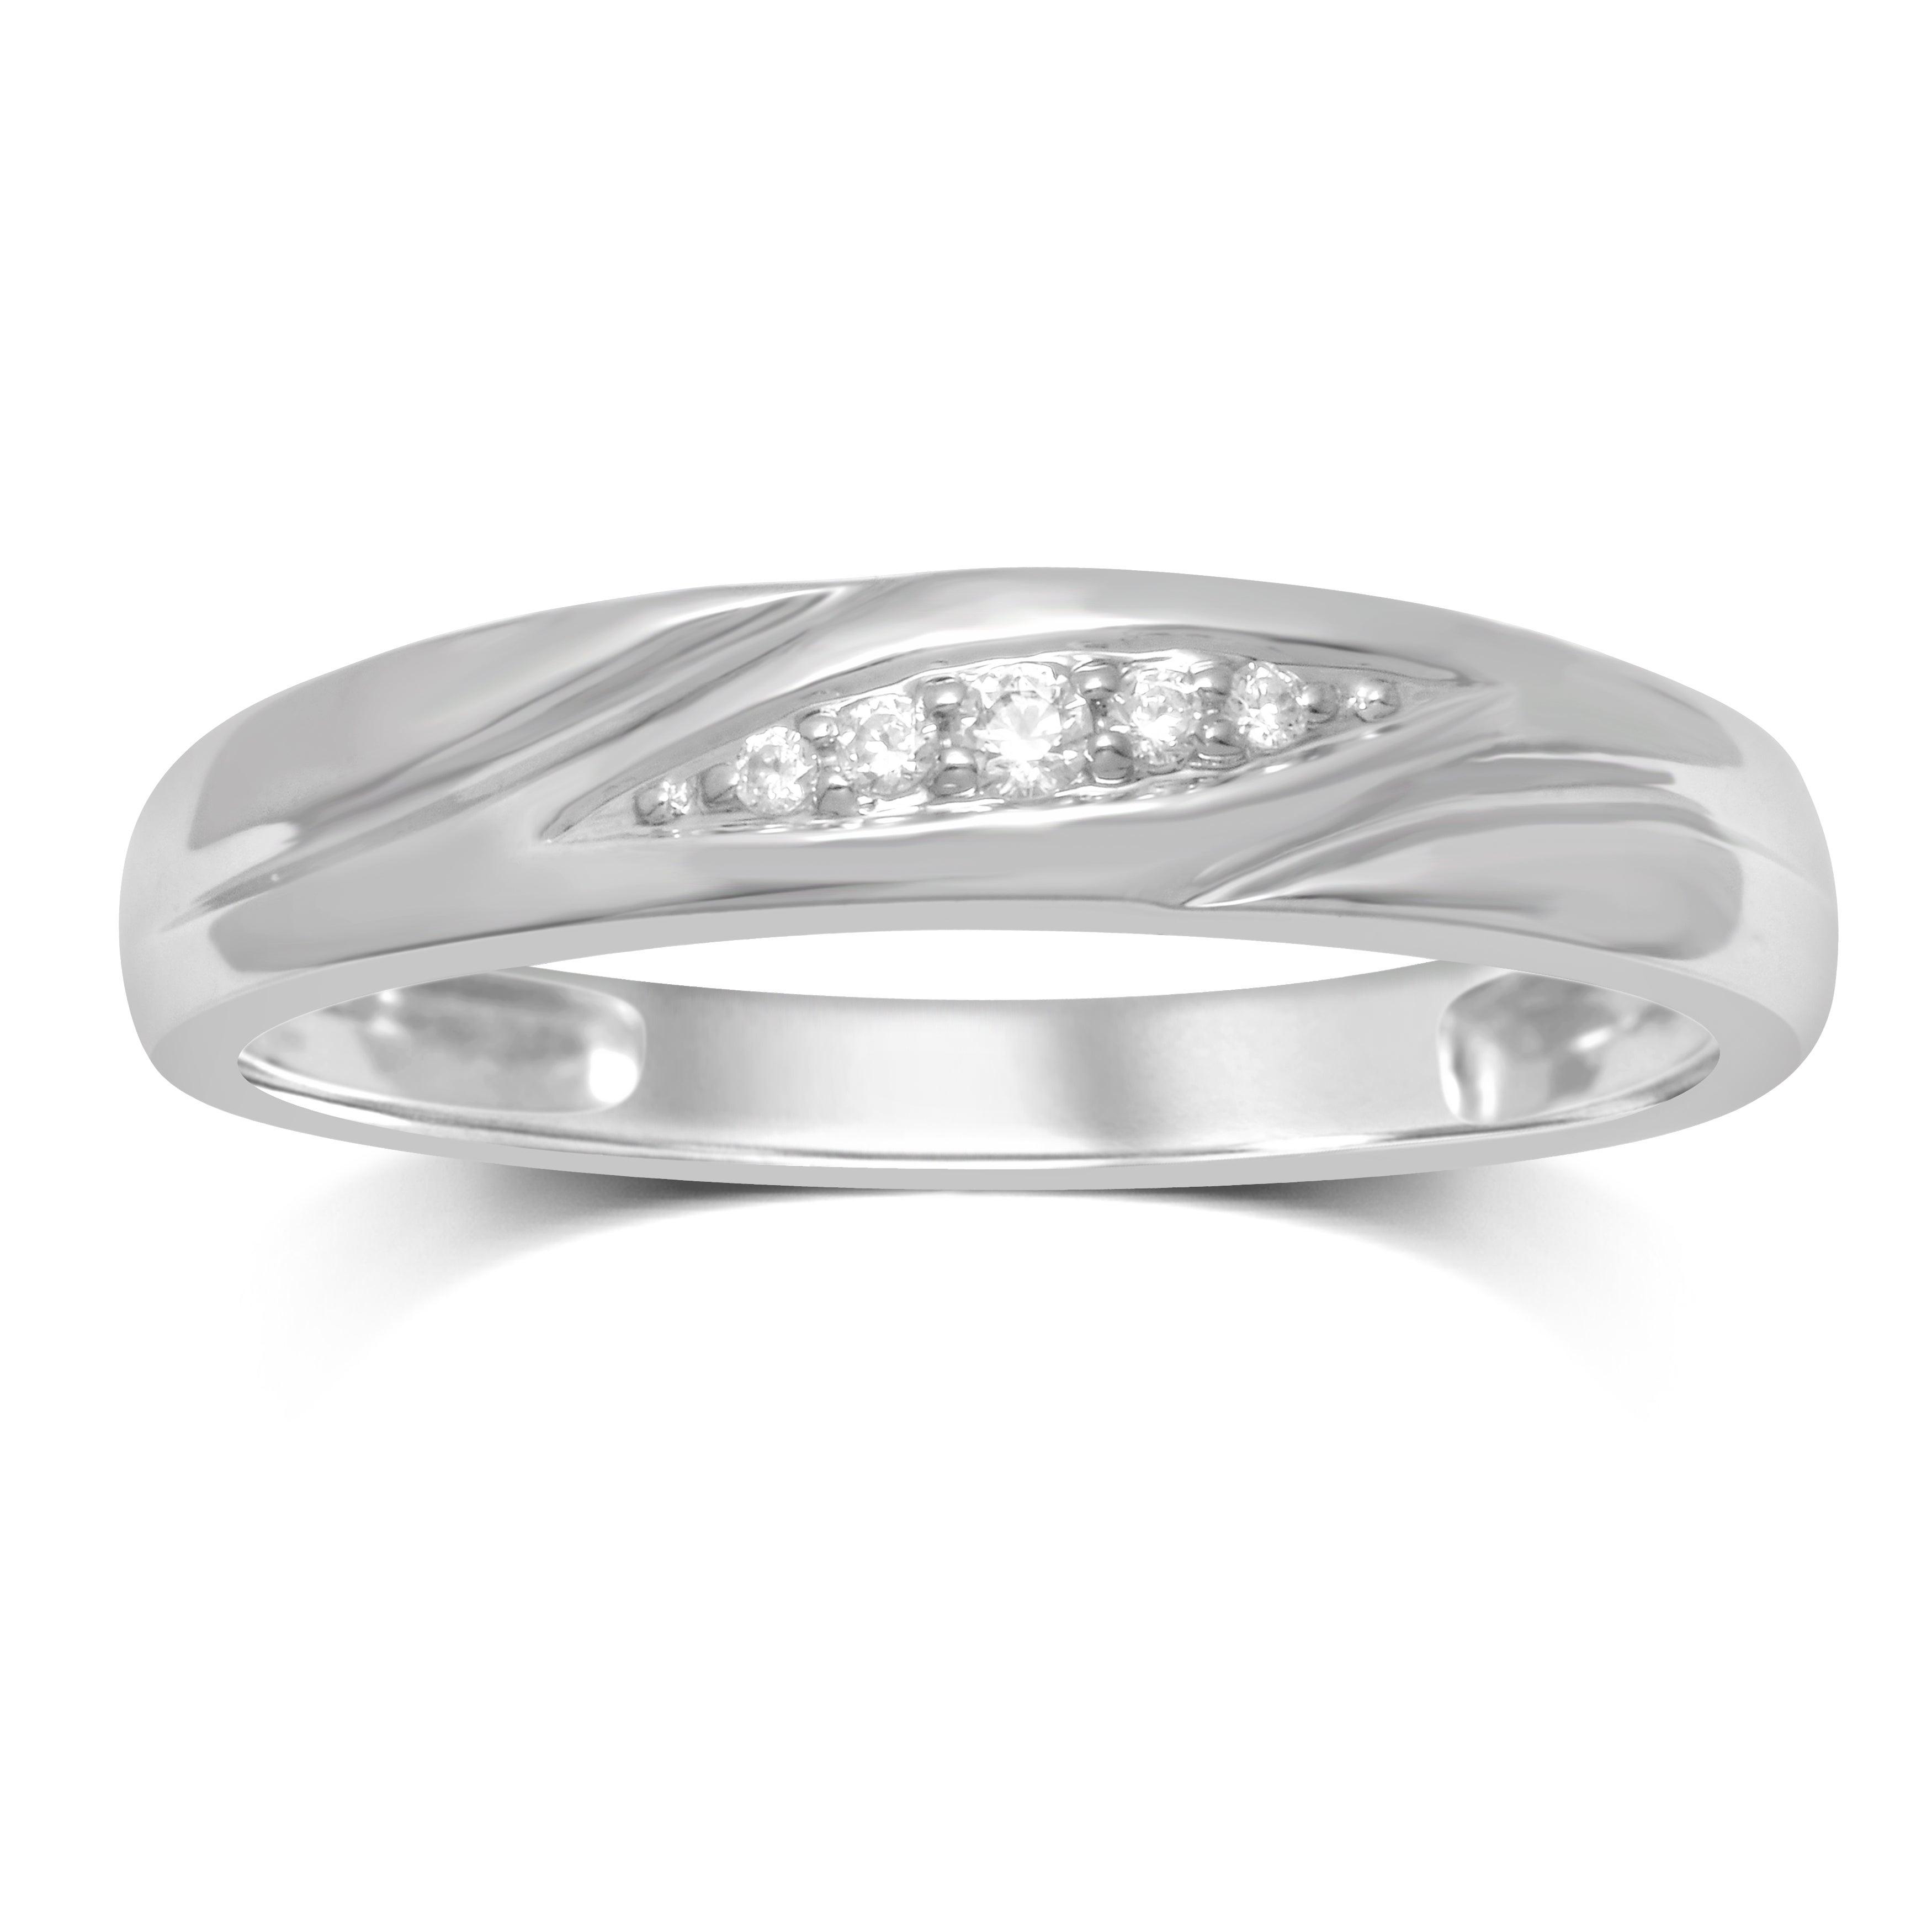 Unending Love 10k White Gold Diamond Slant Row Accent Men's Ring Inside Recent Diamond Slant Anniversary Bands In White Gold (View 7 of 25)